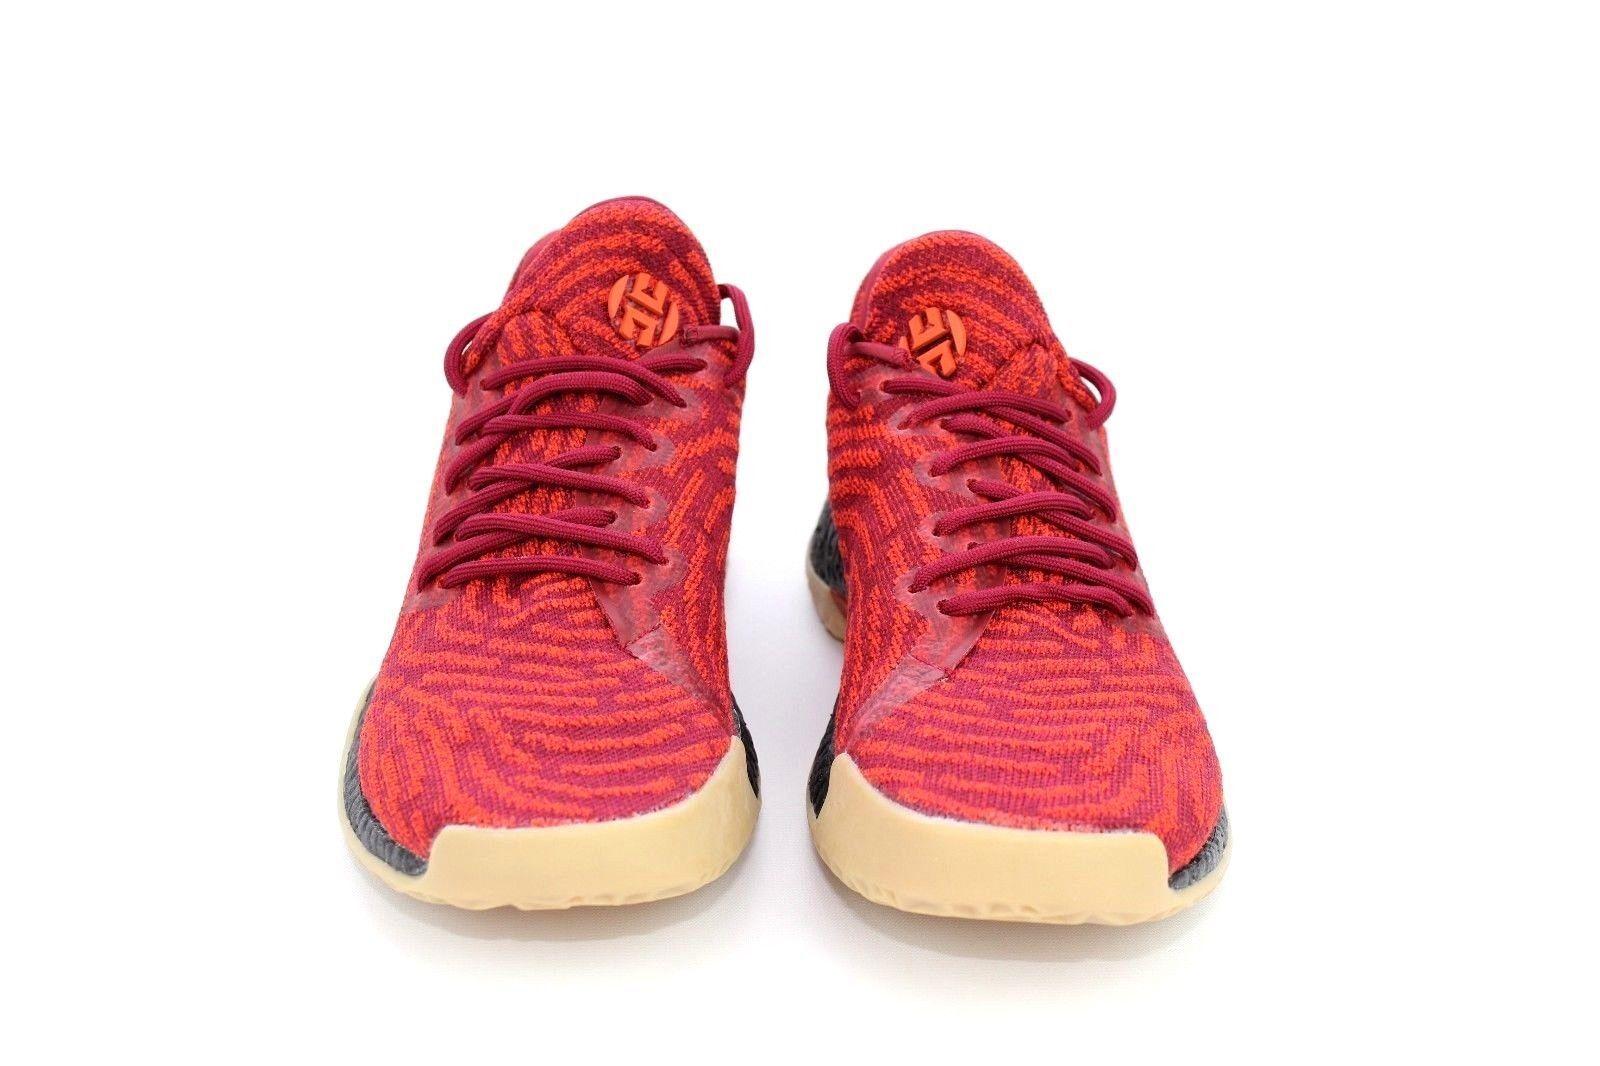 348265829c7 ... Adidas Harden Vol 1 Primeknit Basketball Burgundy CQ1400 CQ1400 CQ1400  Size 8.5 Mens US Boost ae7d3d ...